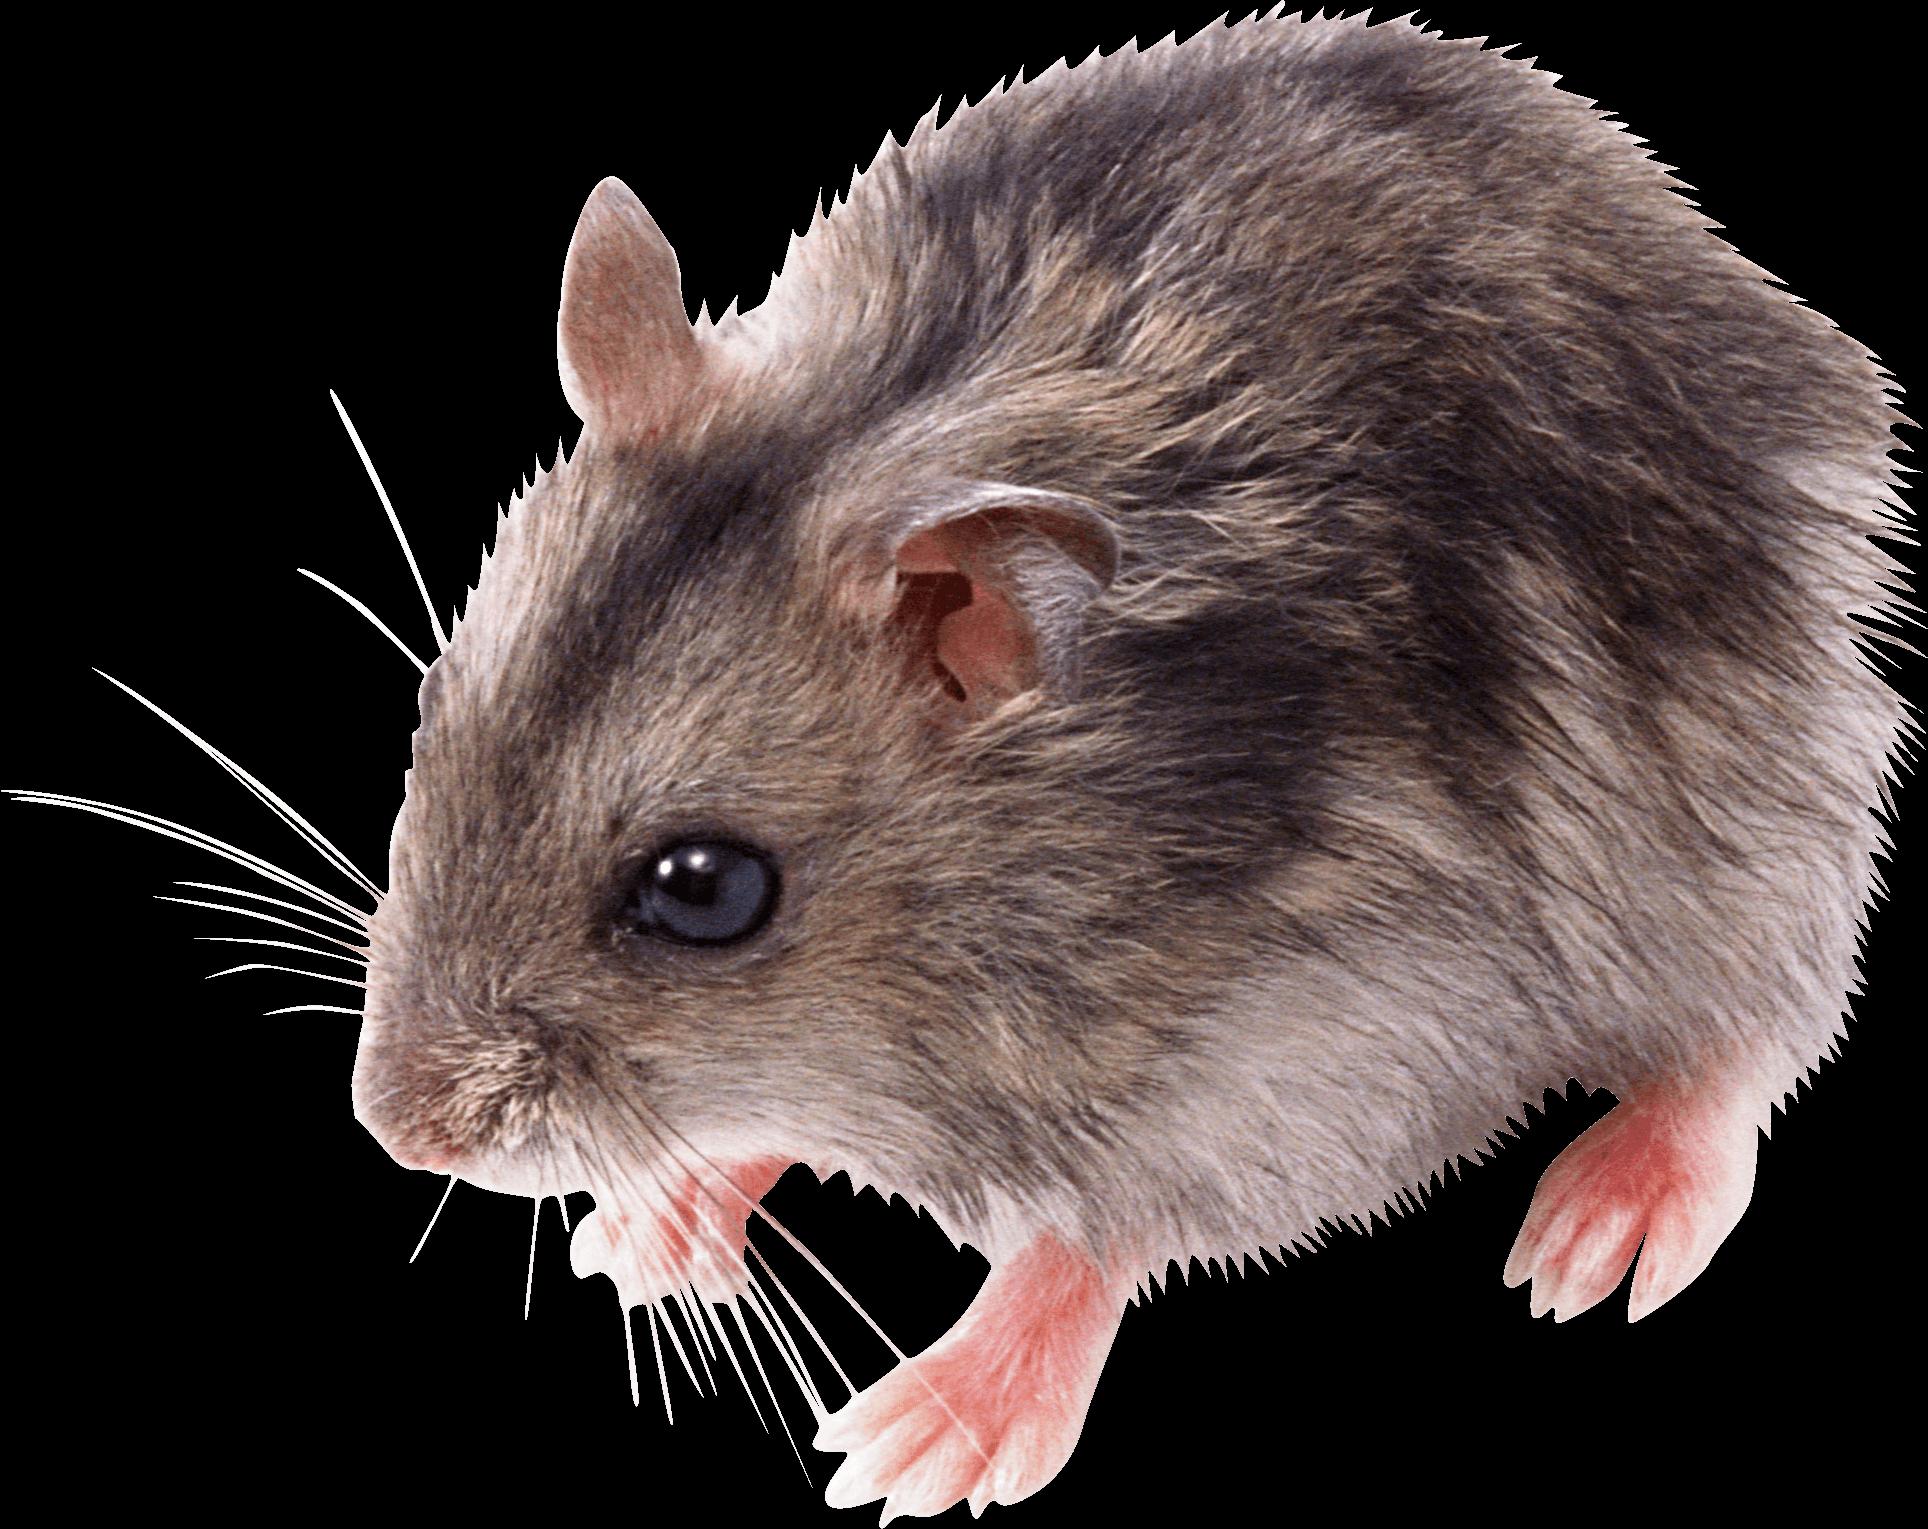 Clipart rat desert mouse. Download little png image